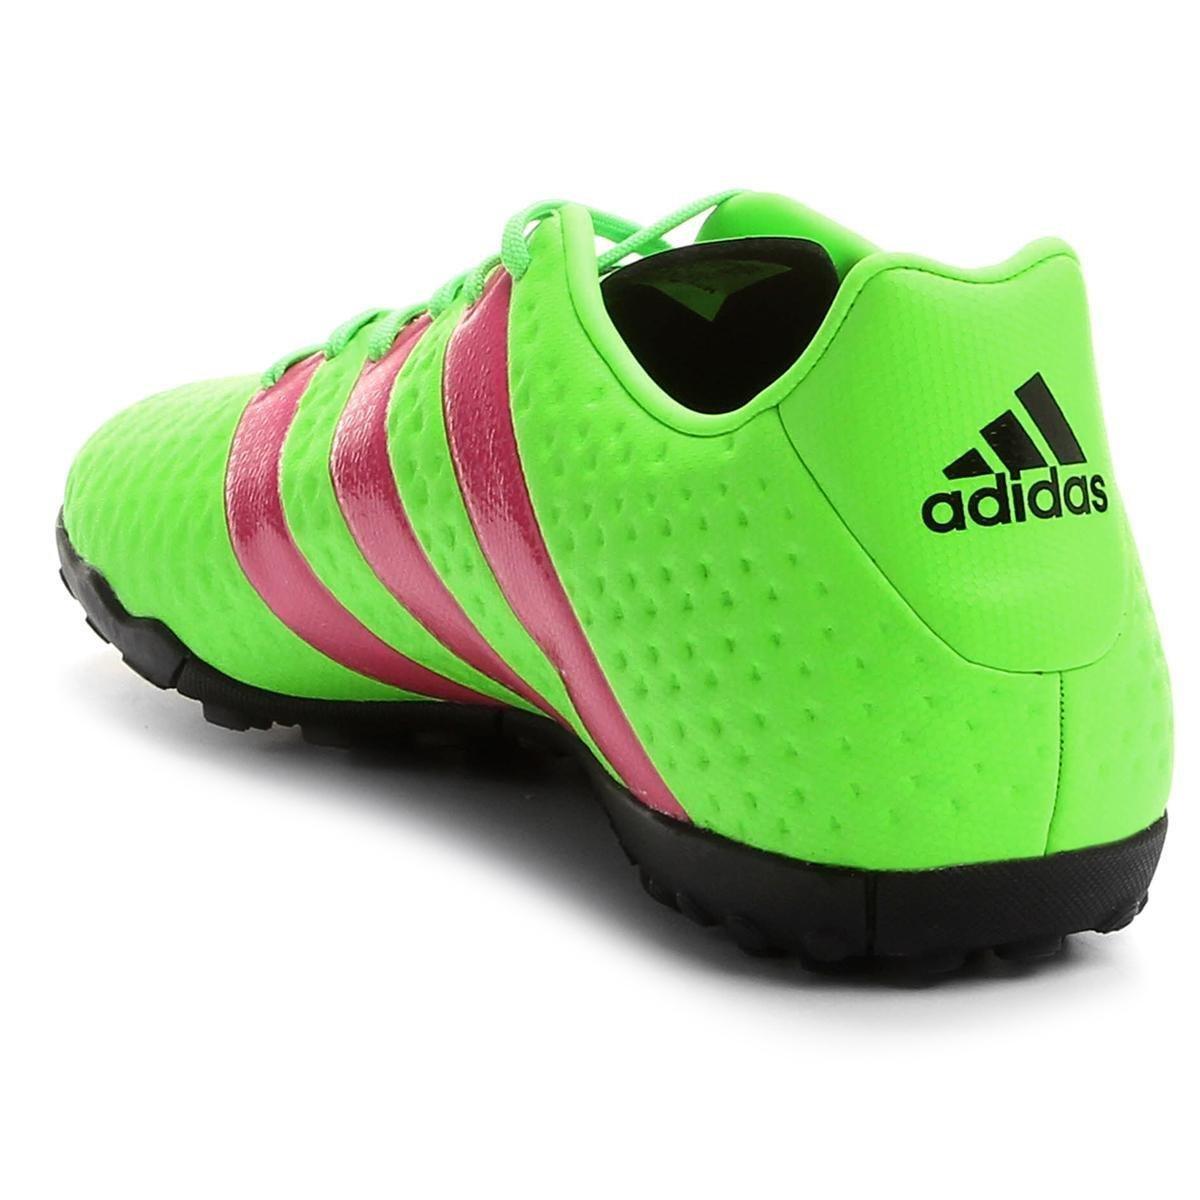 a441f69649 Chuteira Society Adidas Ace 16.4 TF Masculina - Verde Limão e Pink ...